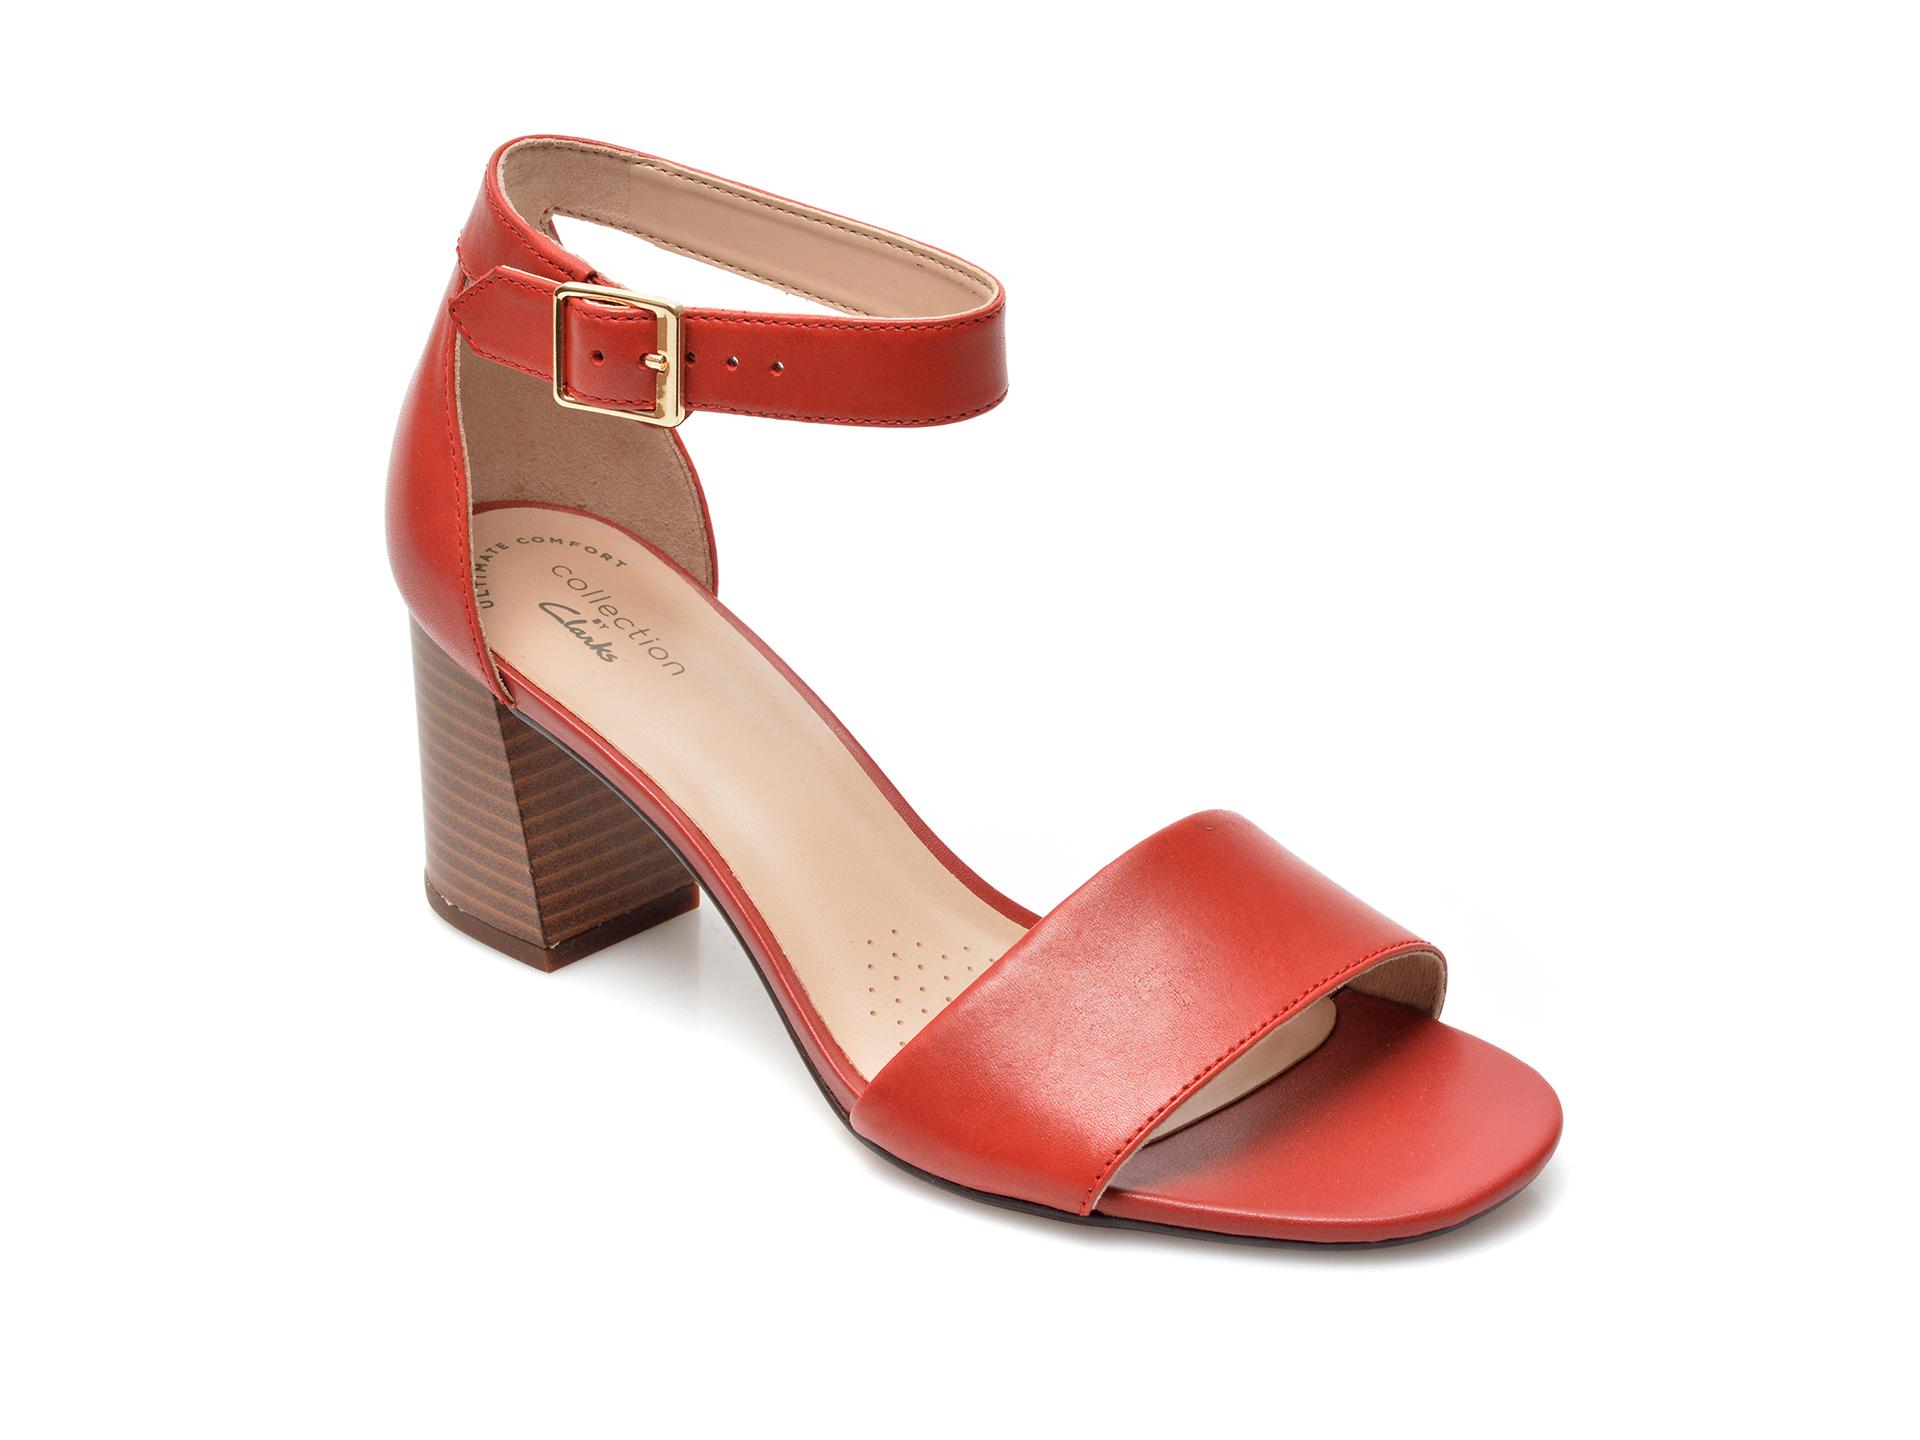 Sandale CLARKS rosii, Jocelynne Cam, din piele naturala imagine otter.ro 2021